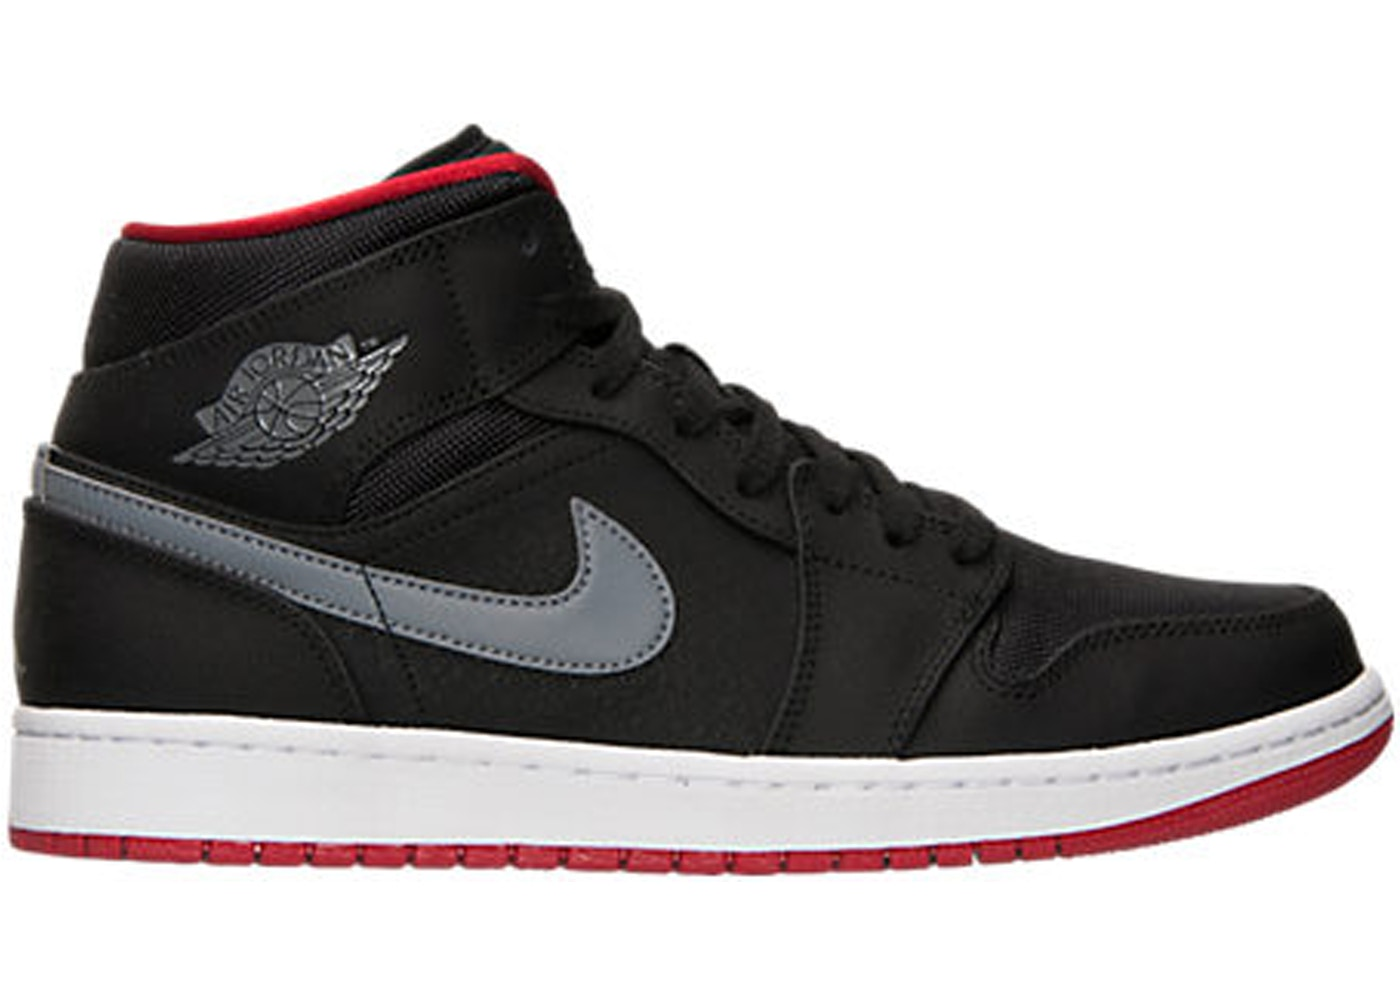 outlet store 6b99e 7de87 Jordan 1 Mid Black Cool Grey Gym Red